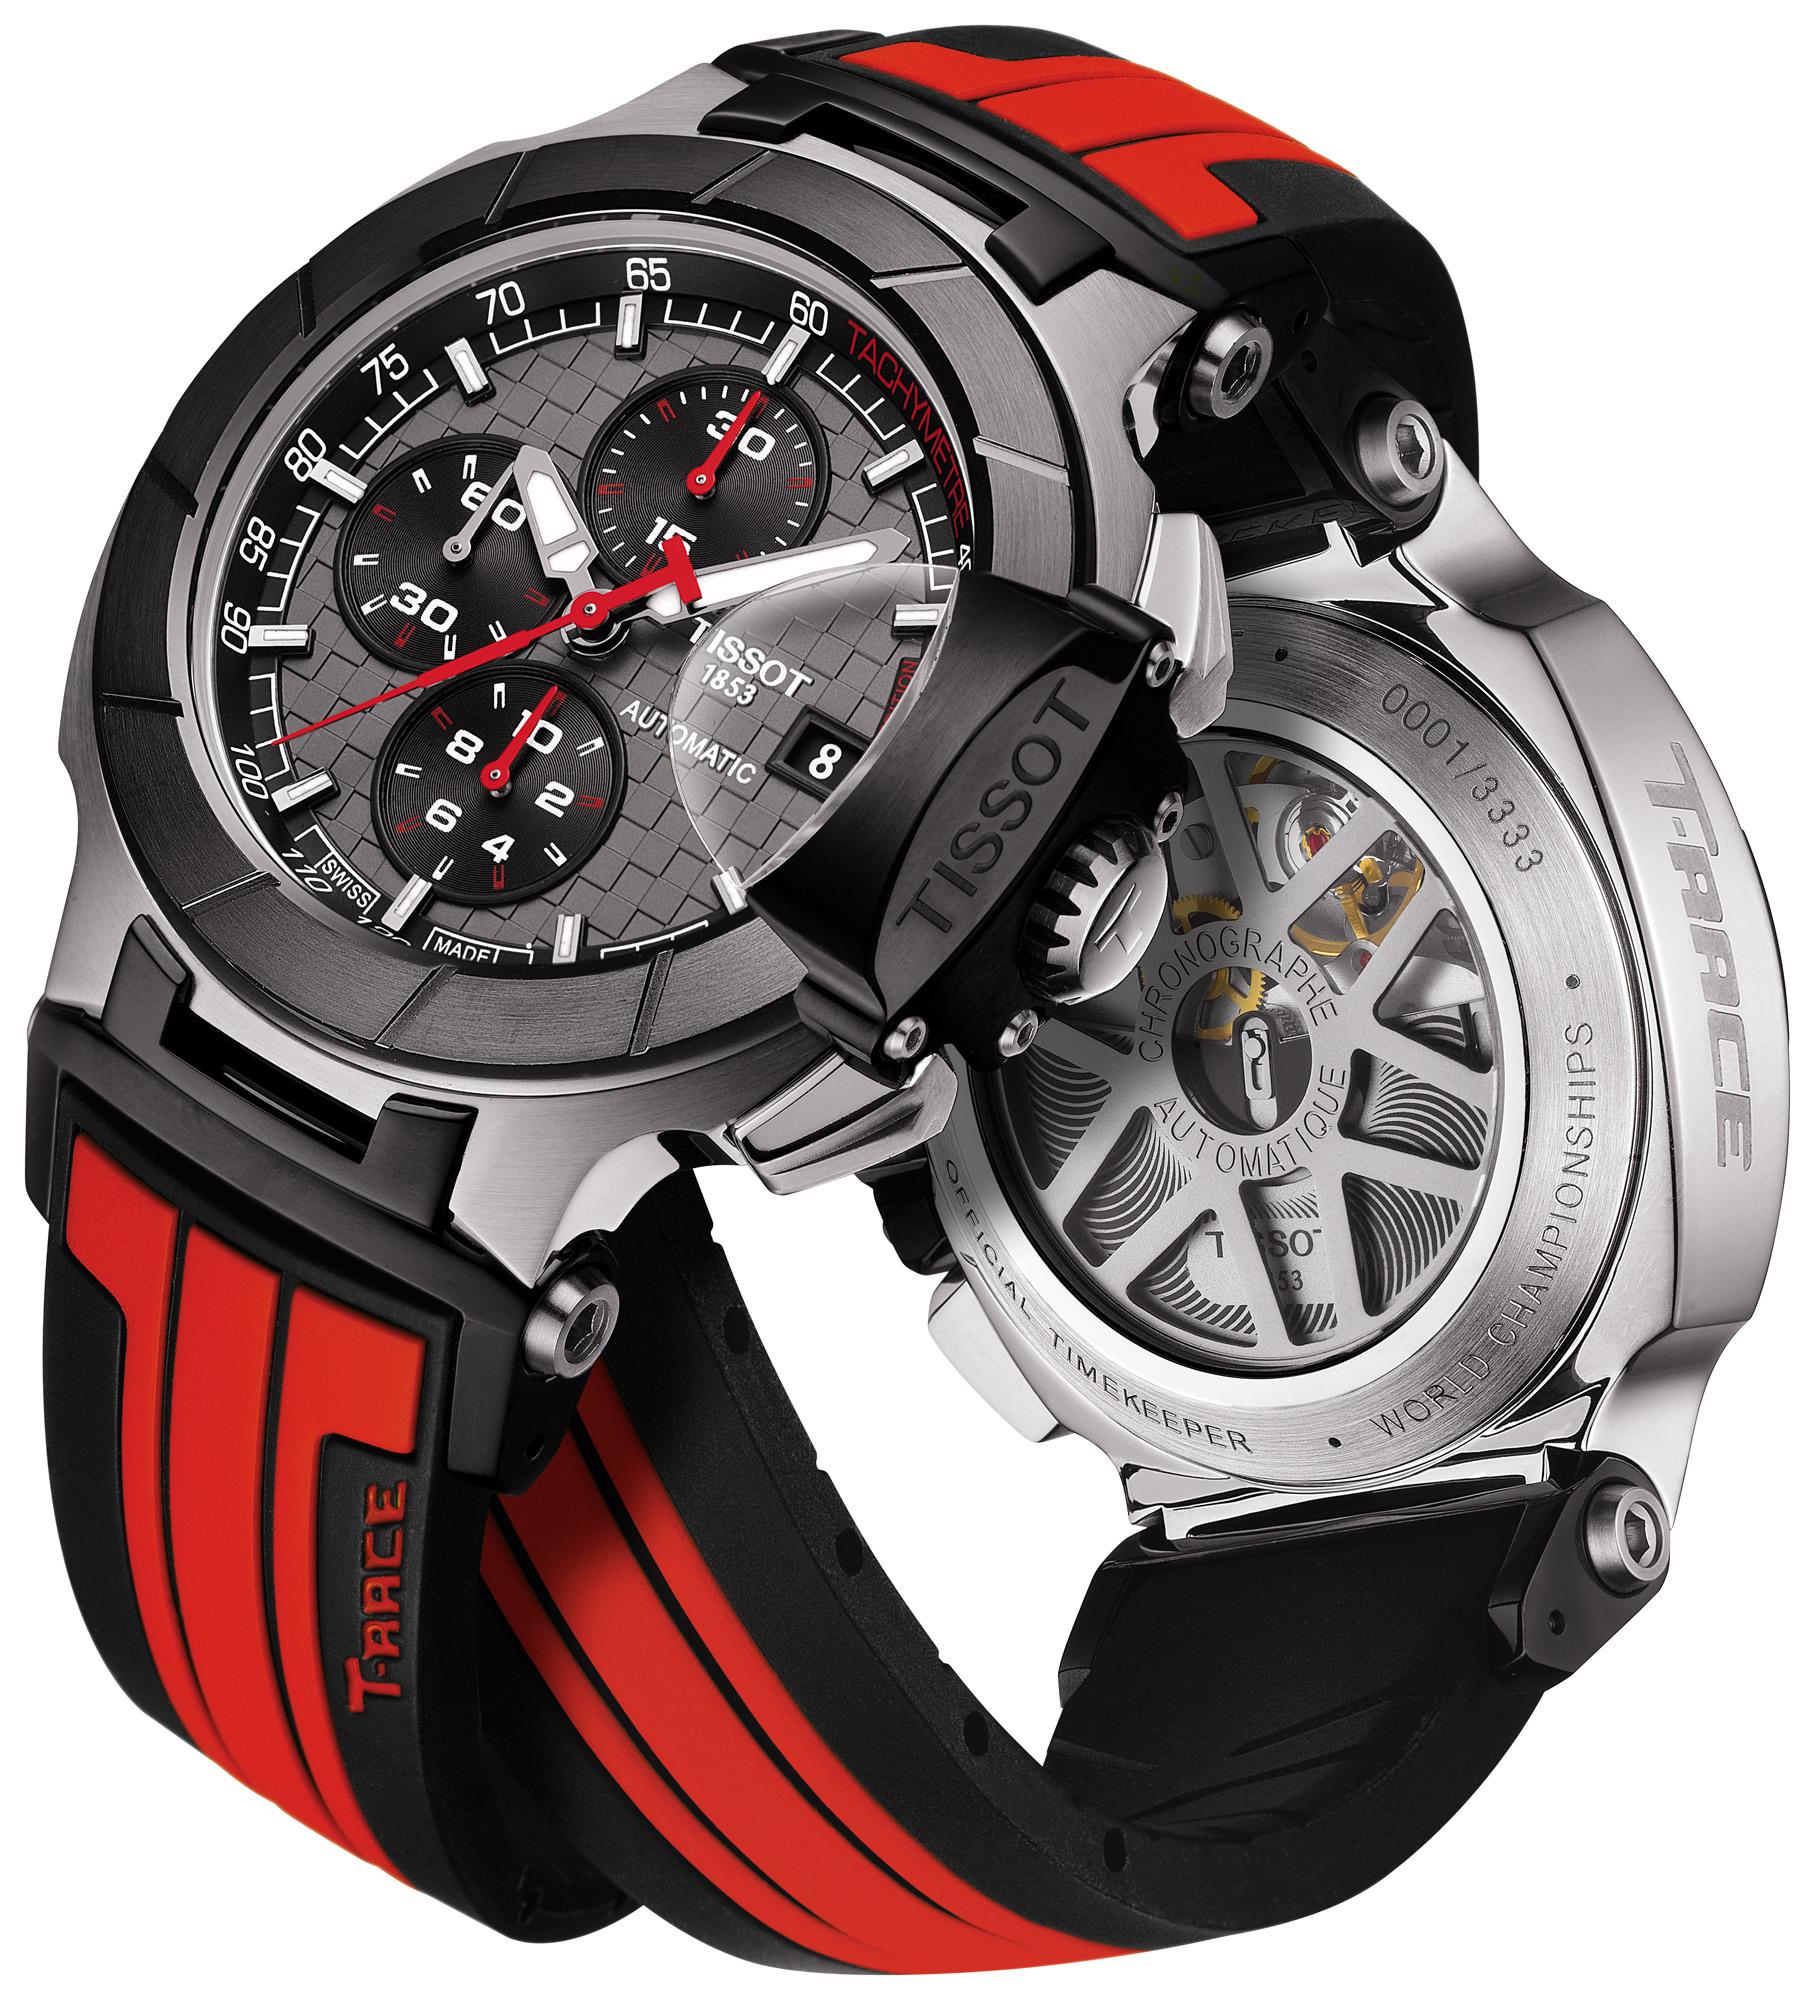 Tissot T-Race MotoGP Automatic Chronograph Limited Edition 2014